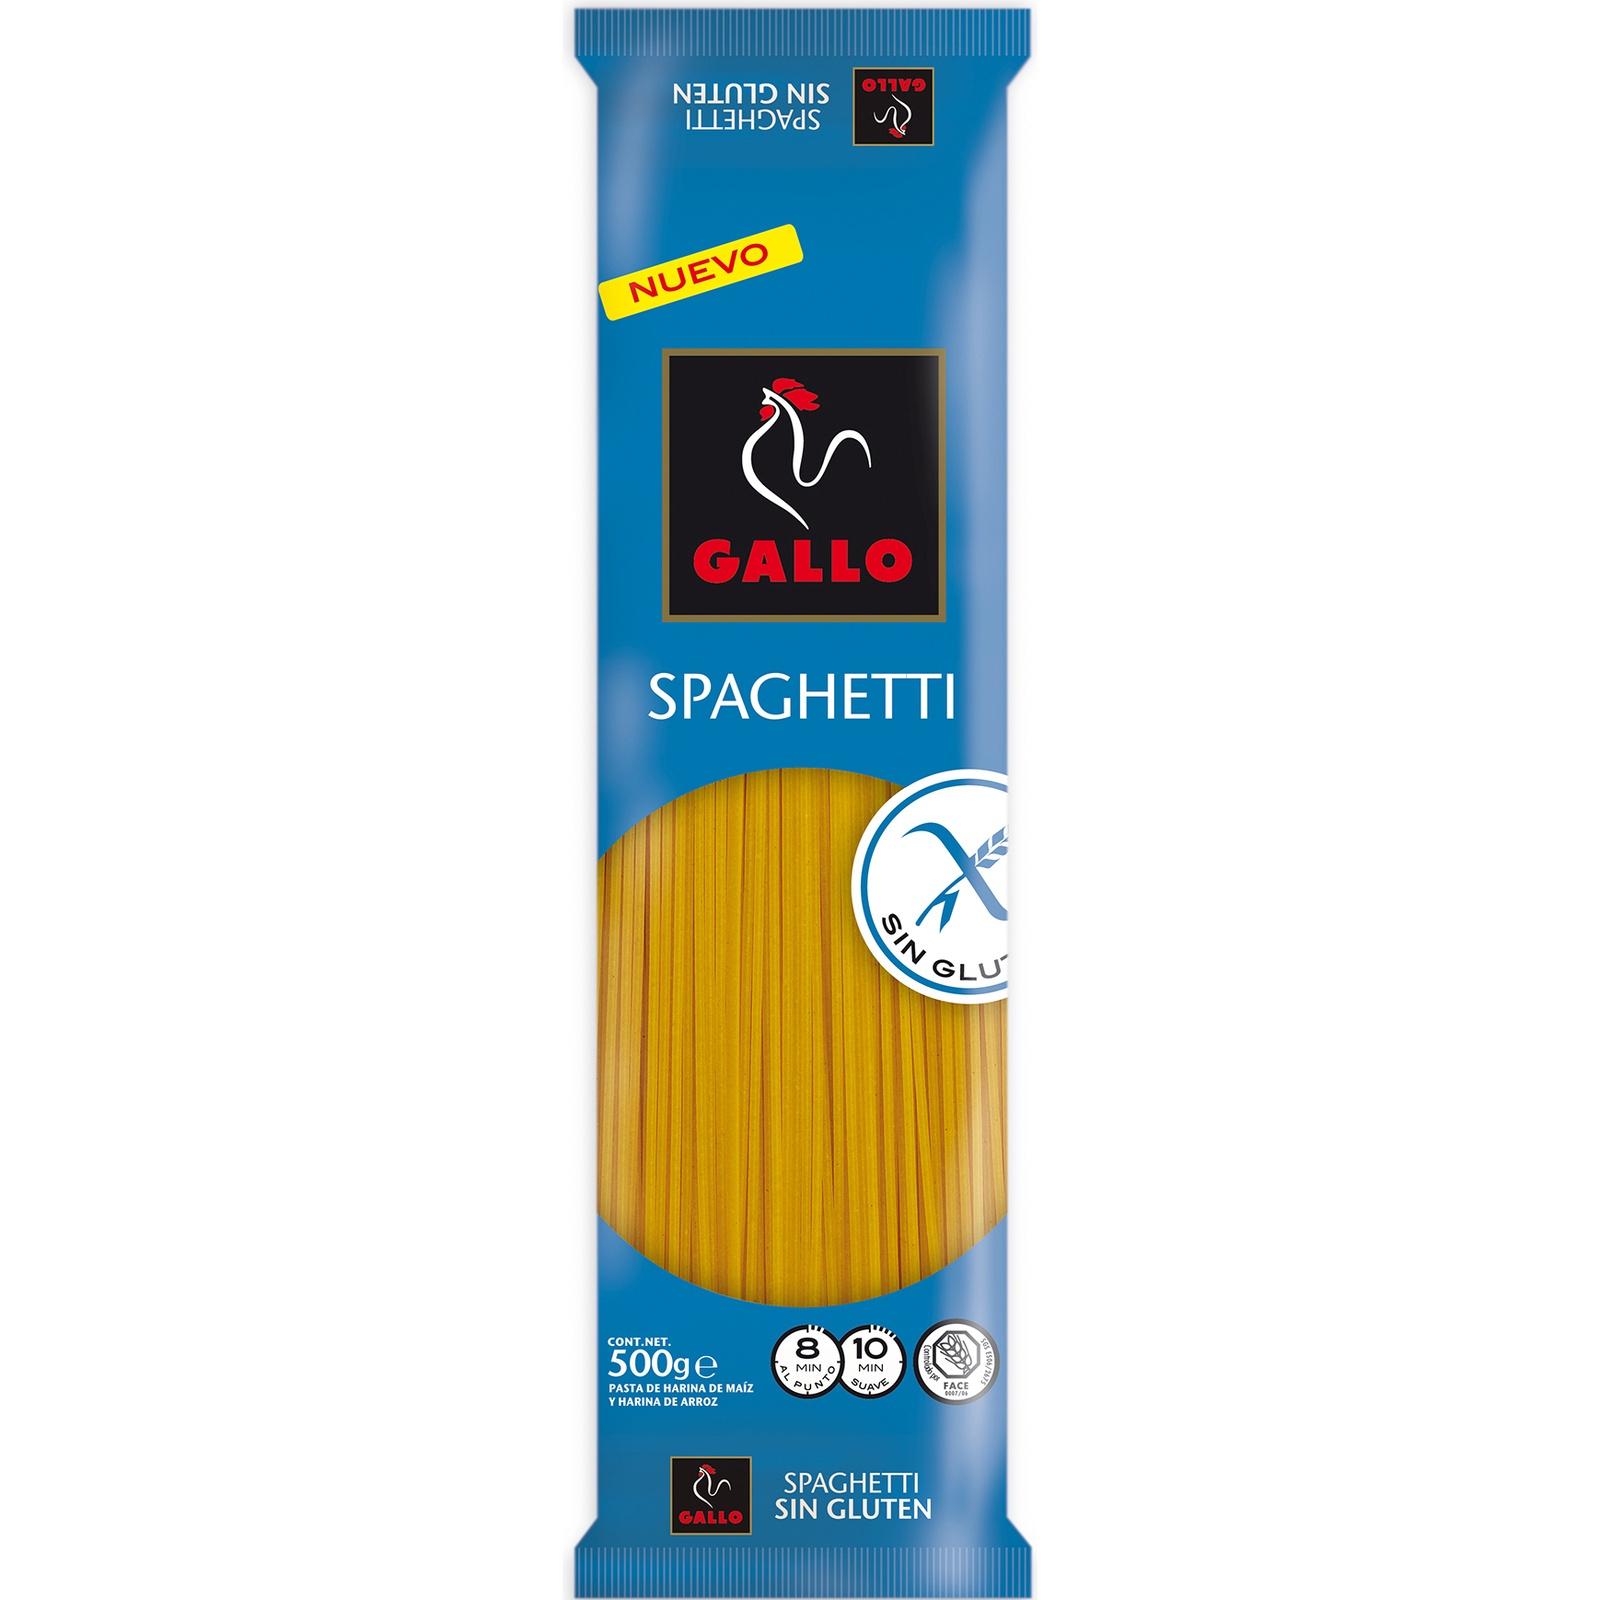 Спагетти без глютена Gallo (Испания) из рисовой и кукурузной муки 500г albert fauvel faune gallo rhenane